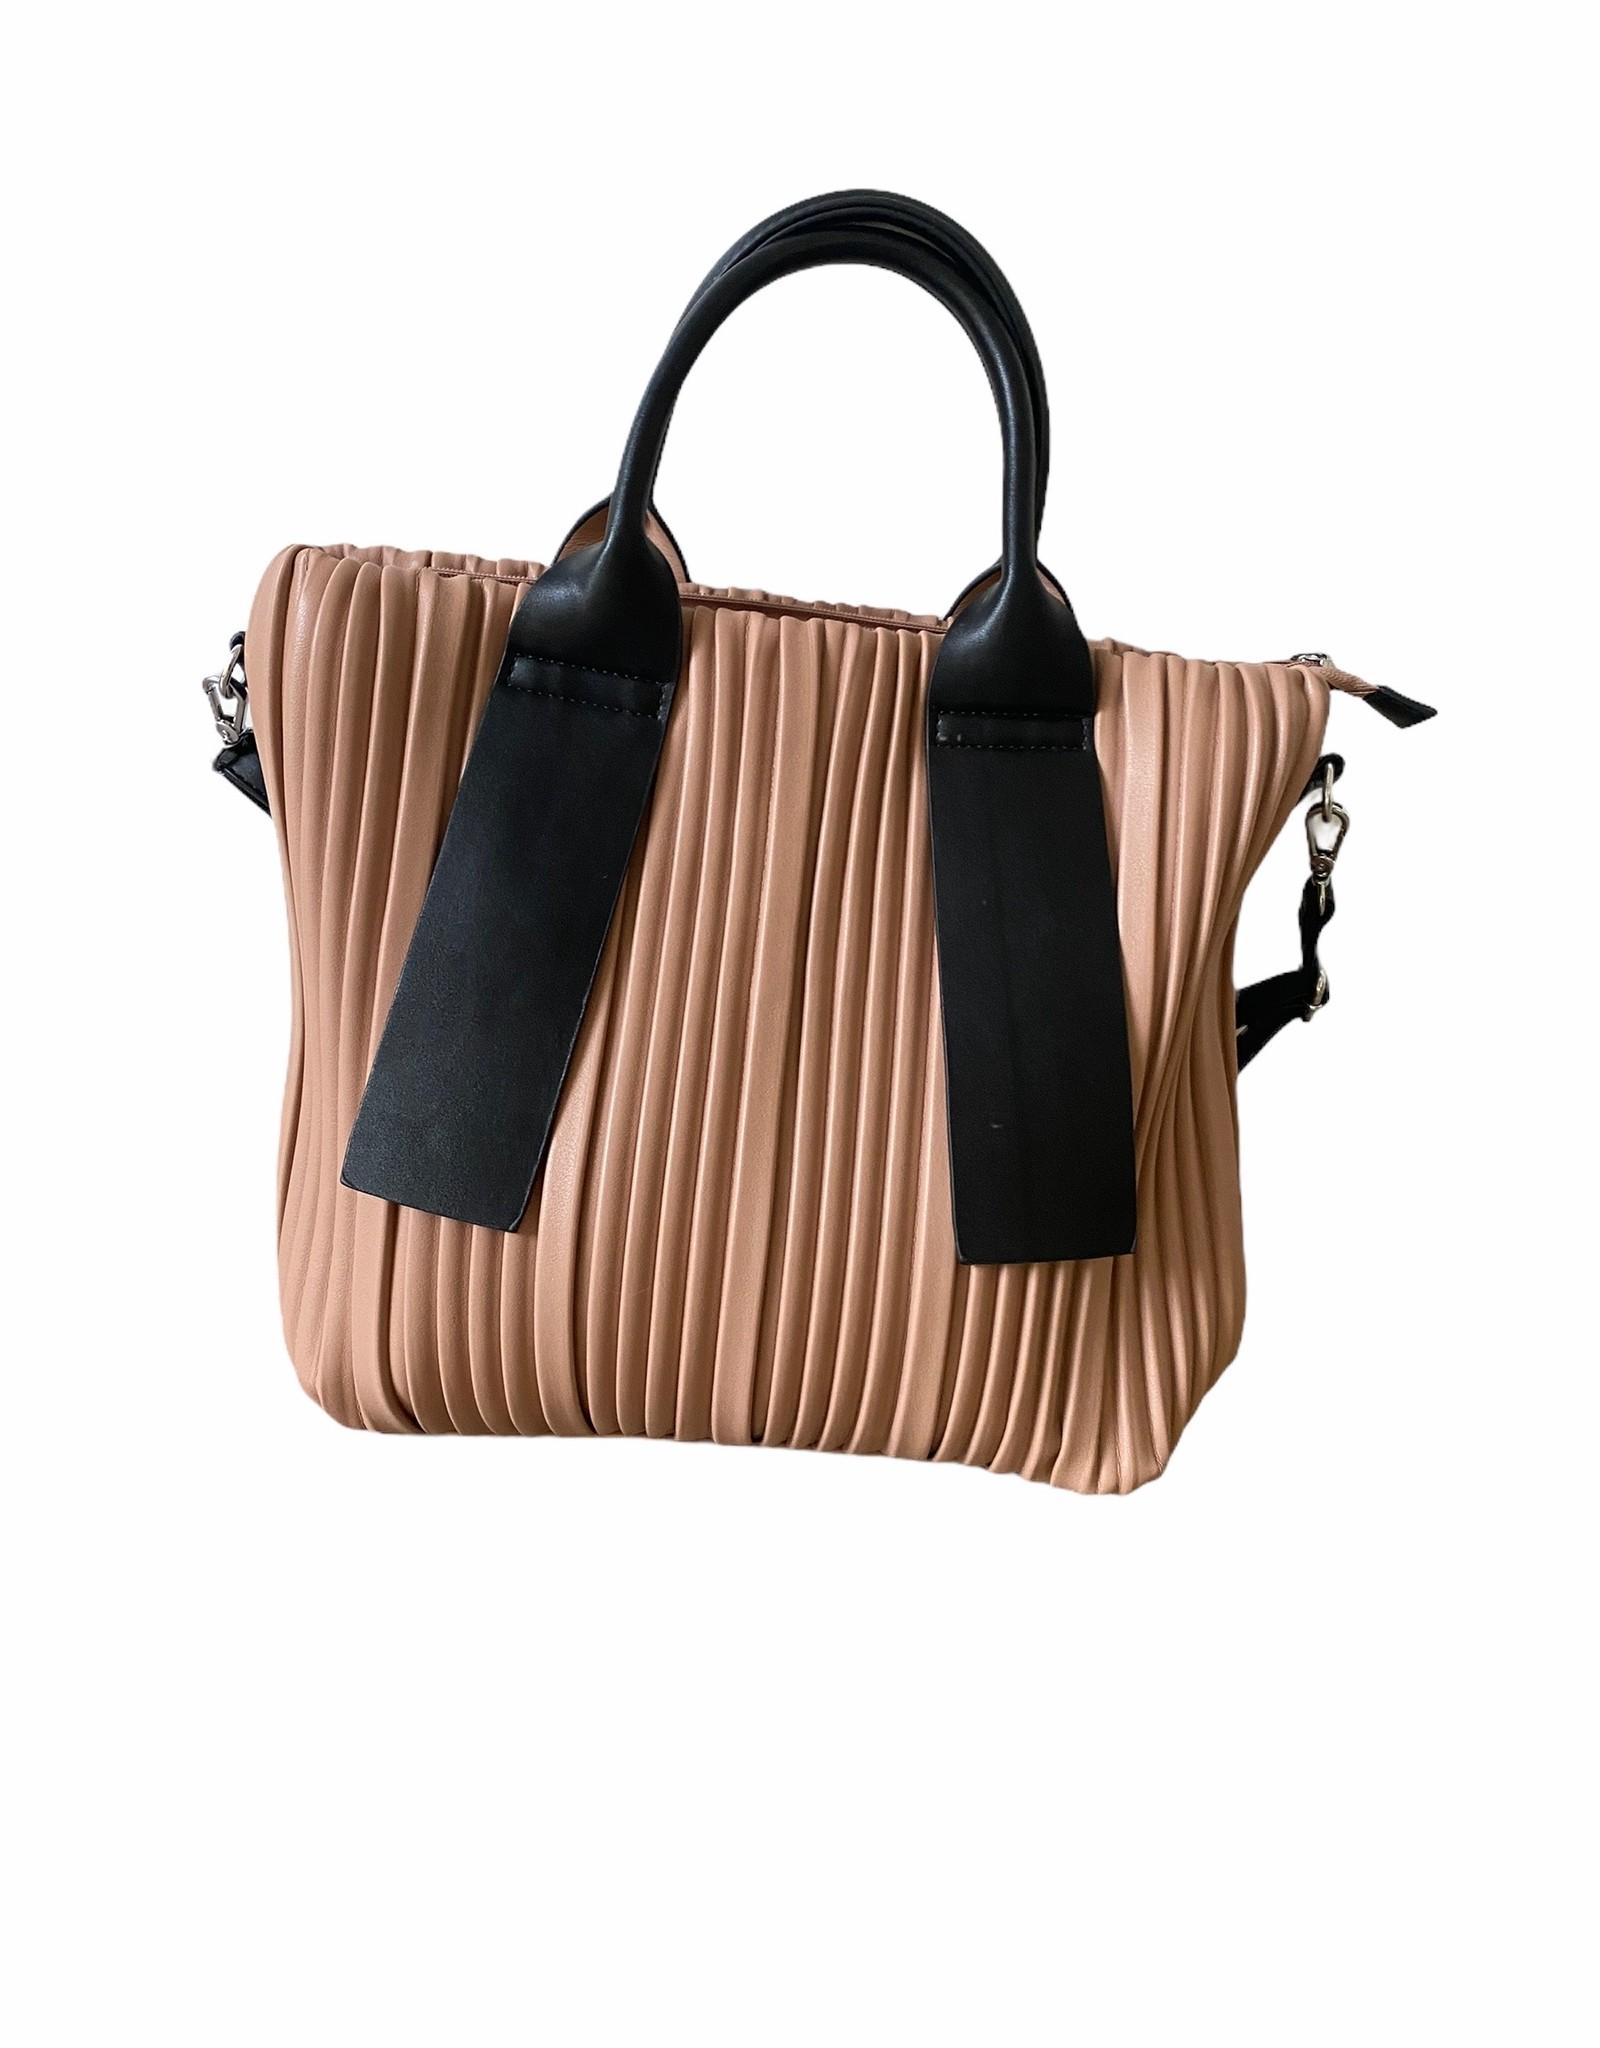 Nude color artificial leather handbag with plissé